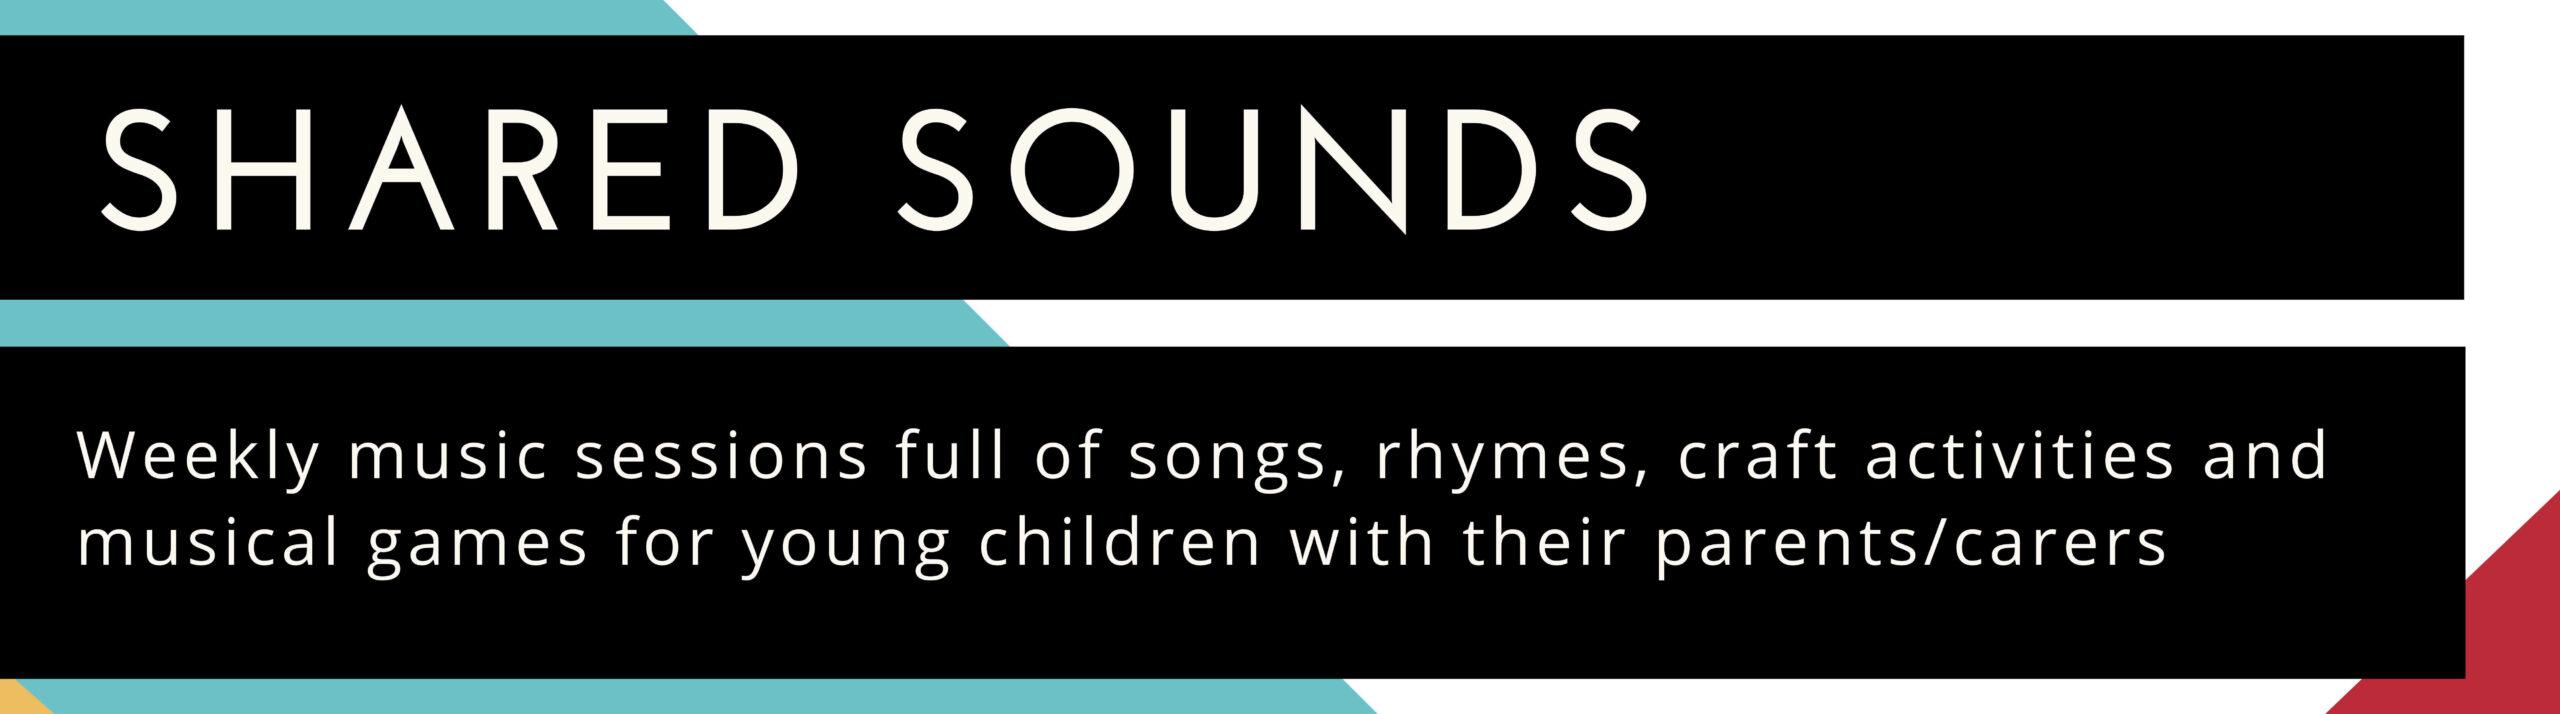 SHARED SOUNDS WEBSITE HEADER